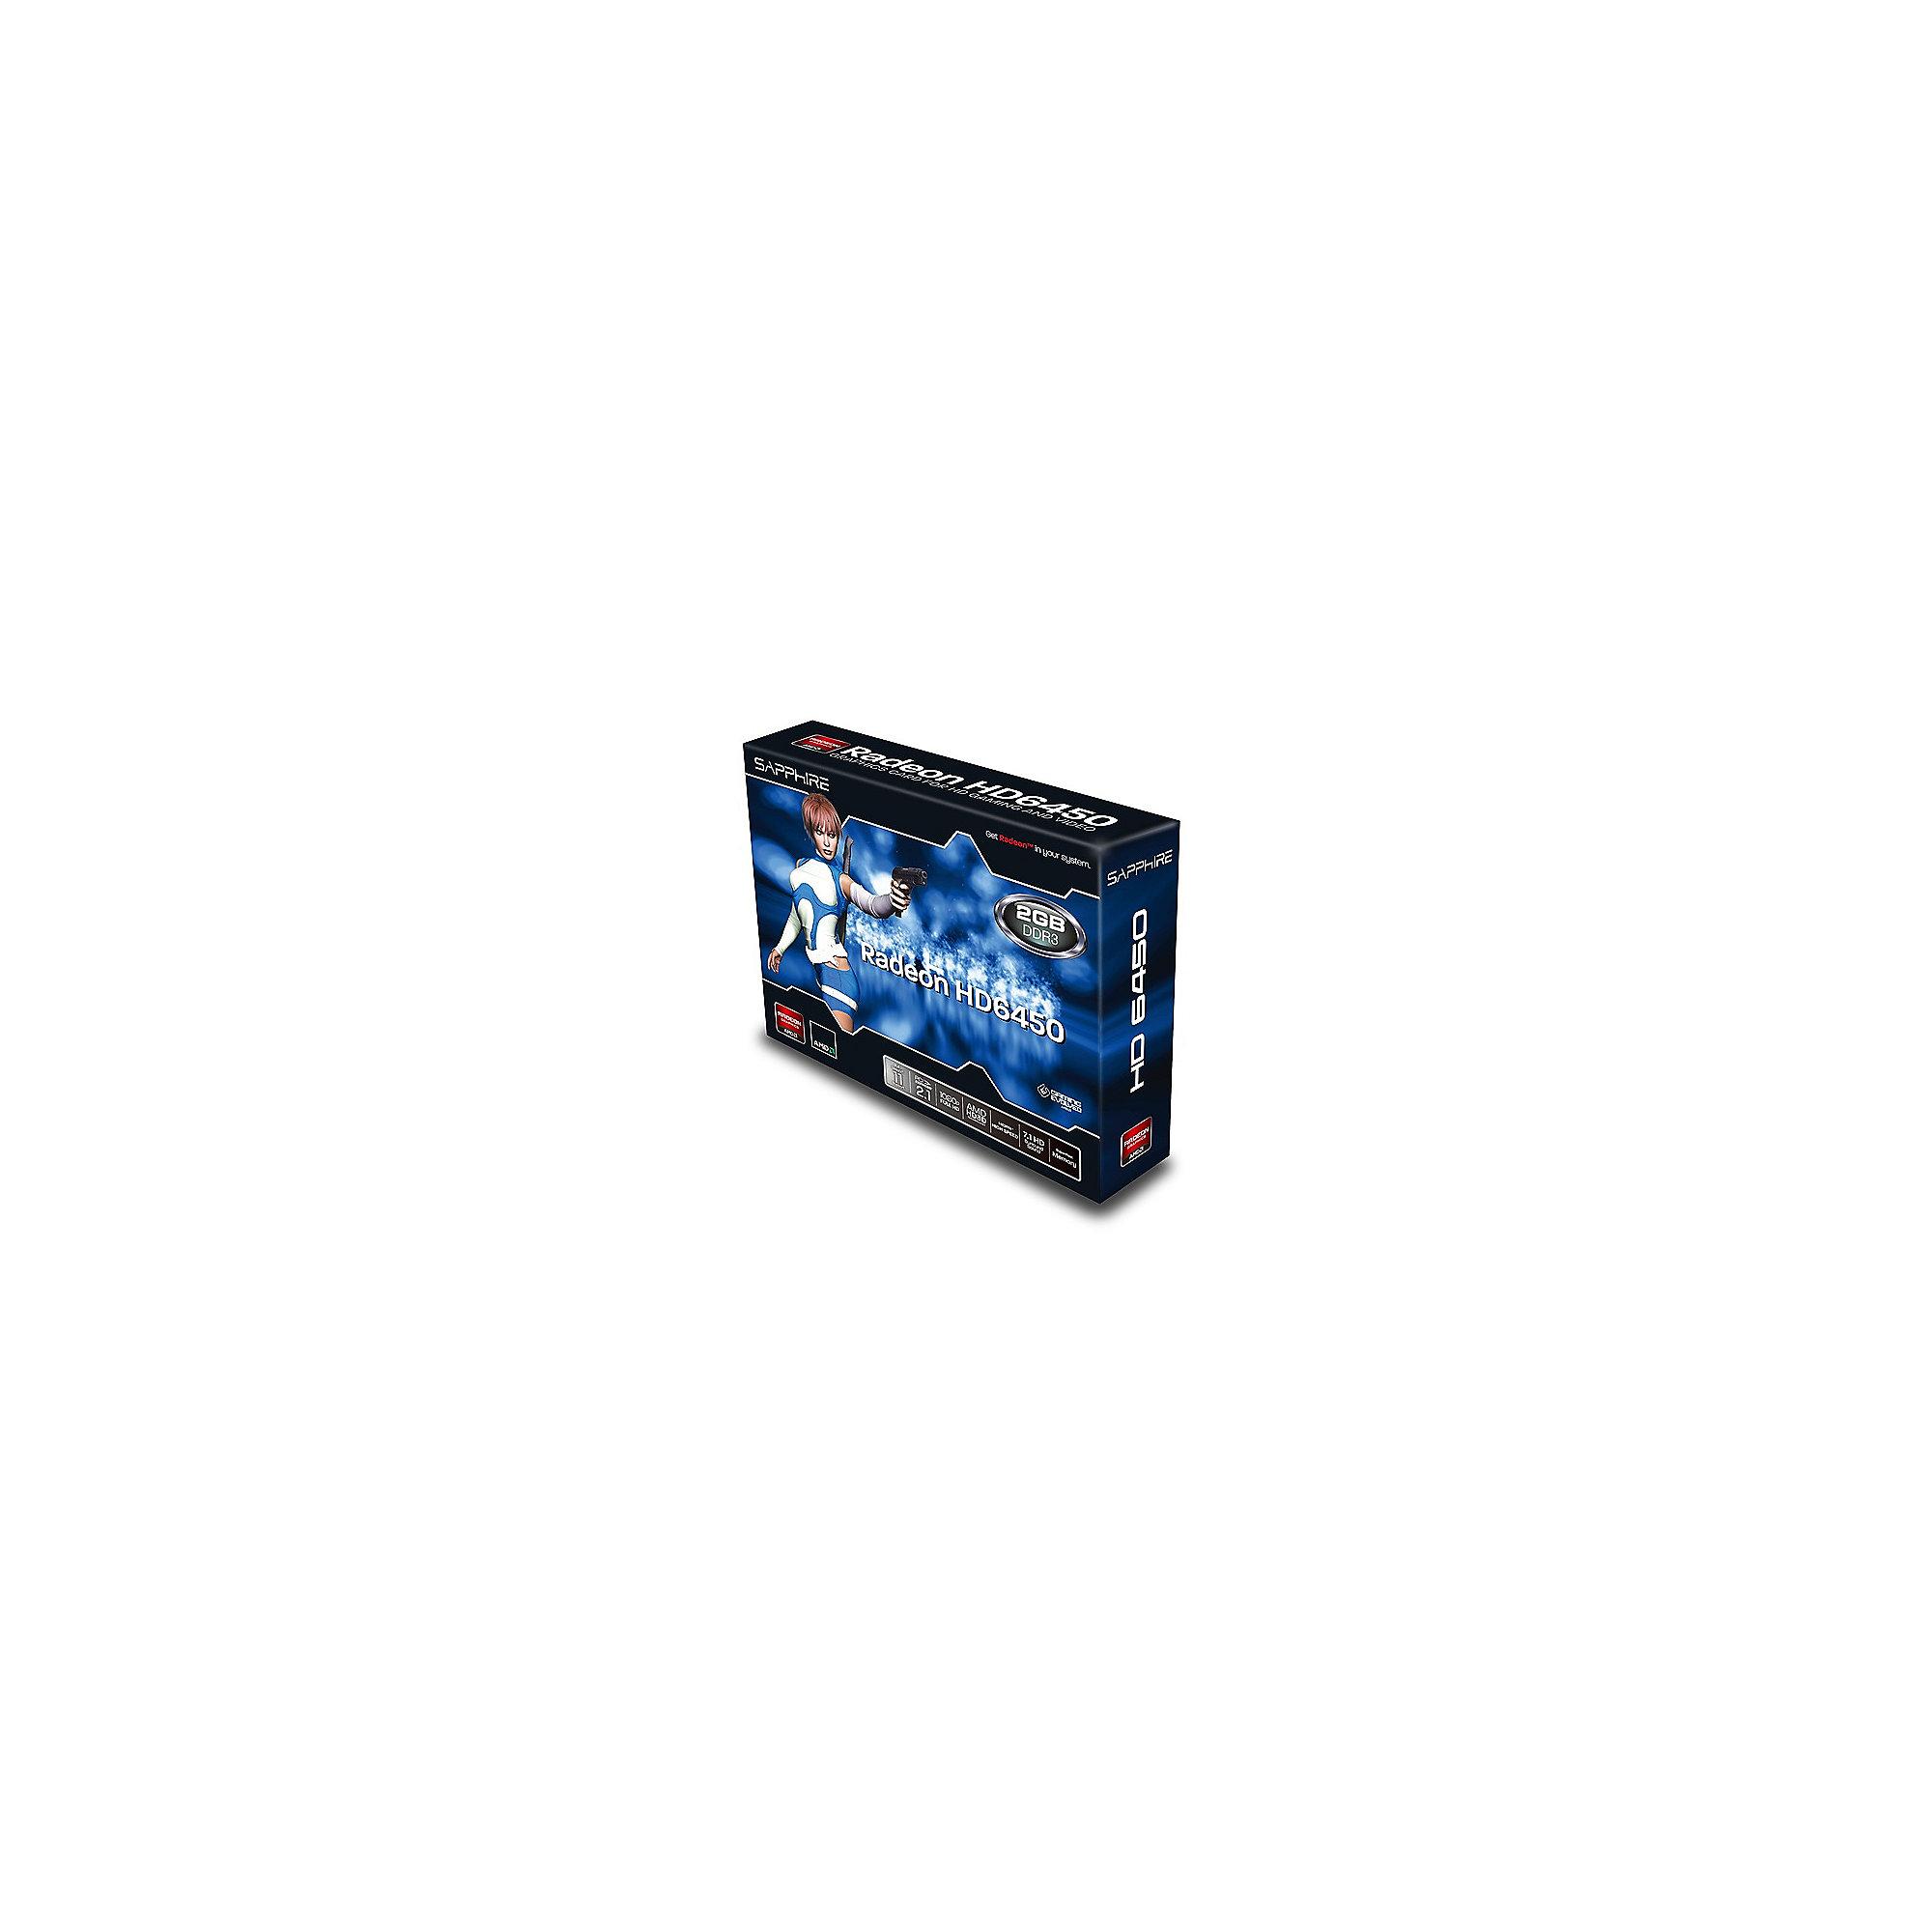 Hd 6450 Dvi To Vga Not Working Lg Uhd Tv 4k 55 Bluetooth Tv Smart Samsung Como Conectar A Internet Why Is The Projector Yellow: Sapphire Radeon HD 6450 2GB DDR3 PCIe Grafikkarte DVI/HDMI